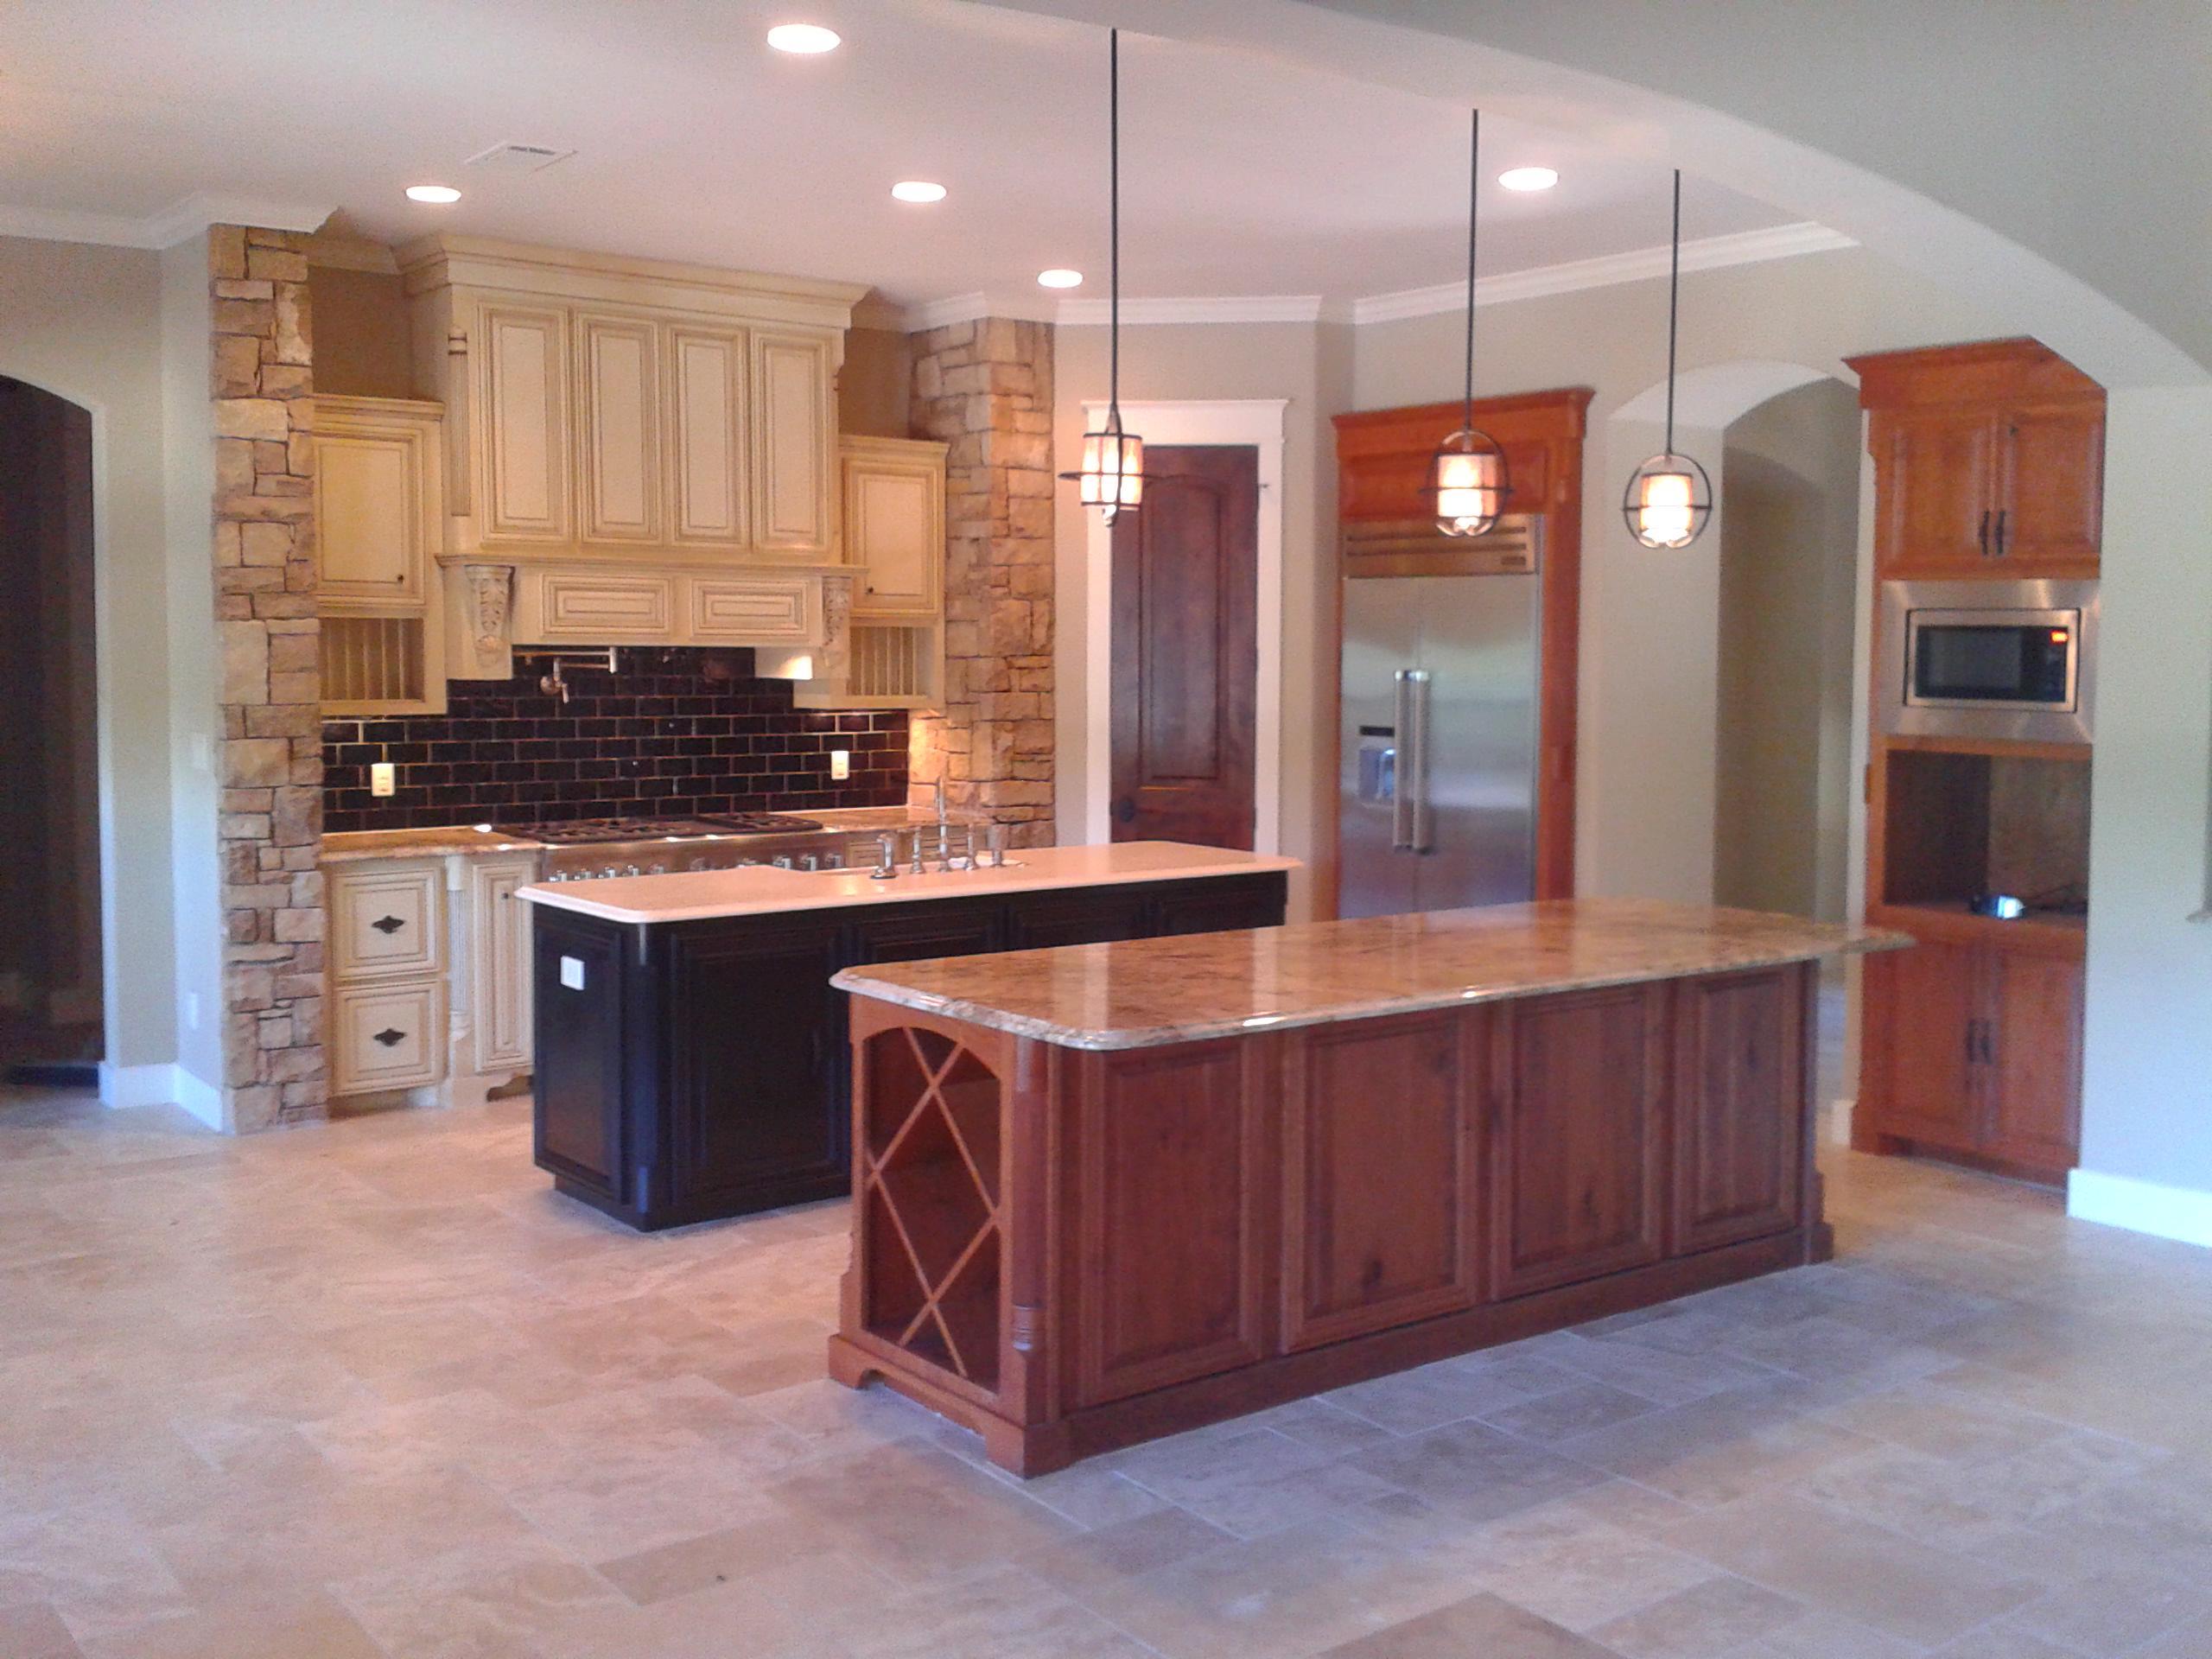 custom kitchen cabinets  designed by JB Murphy company